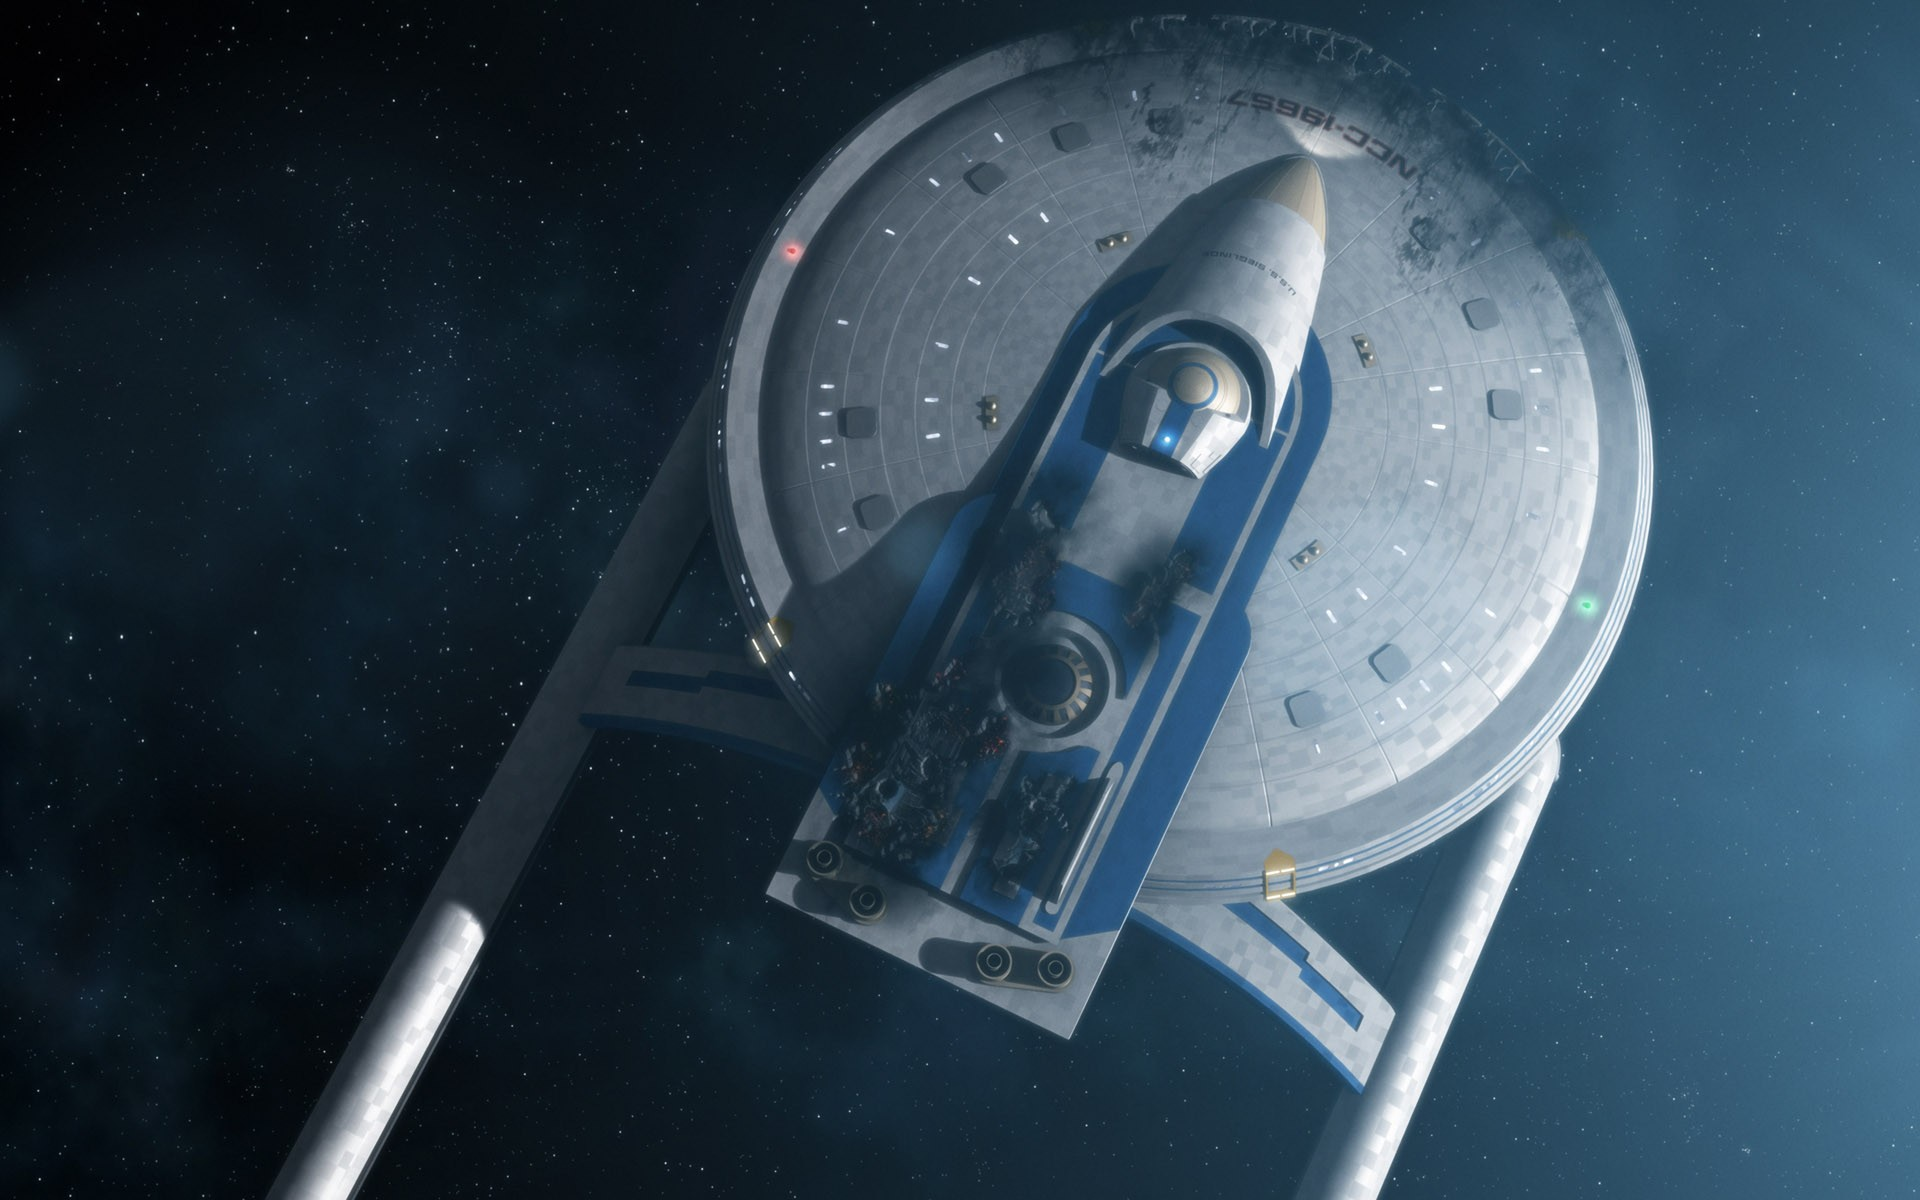 Star Trek Battle Damaged U - Star Trek Futuristic Sci Fi Spaceships , HD Wallpaper & Backgrounds